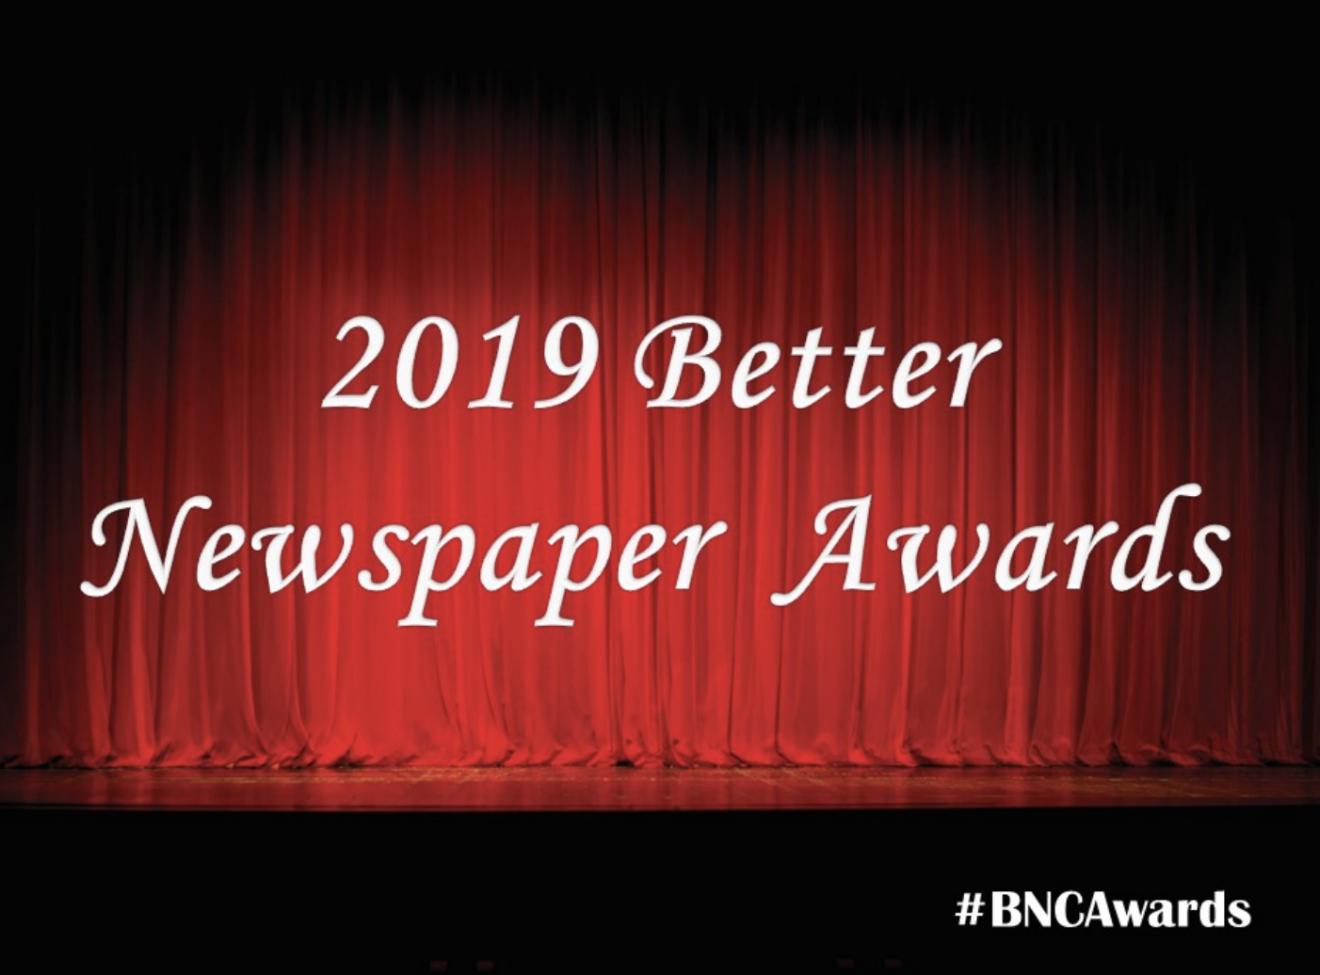 OCNA announces 2019 BNC Award winners